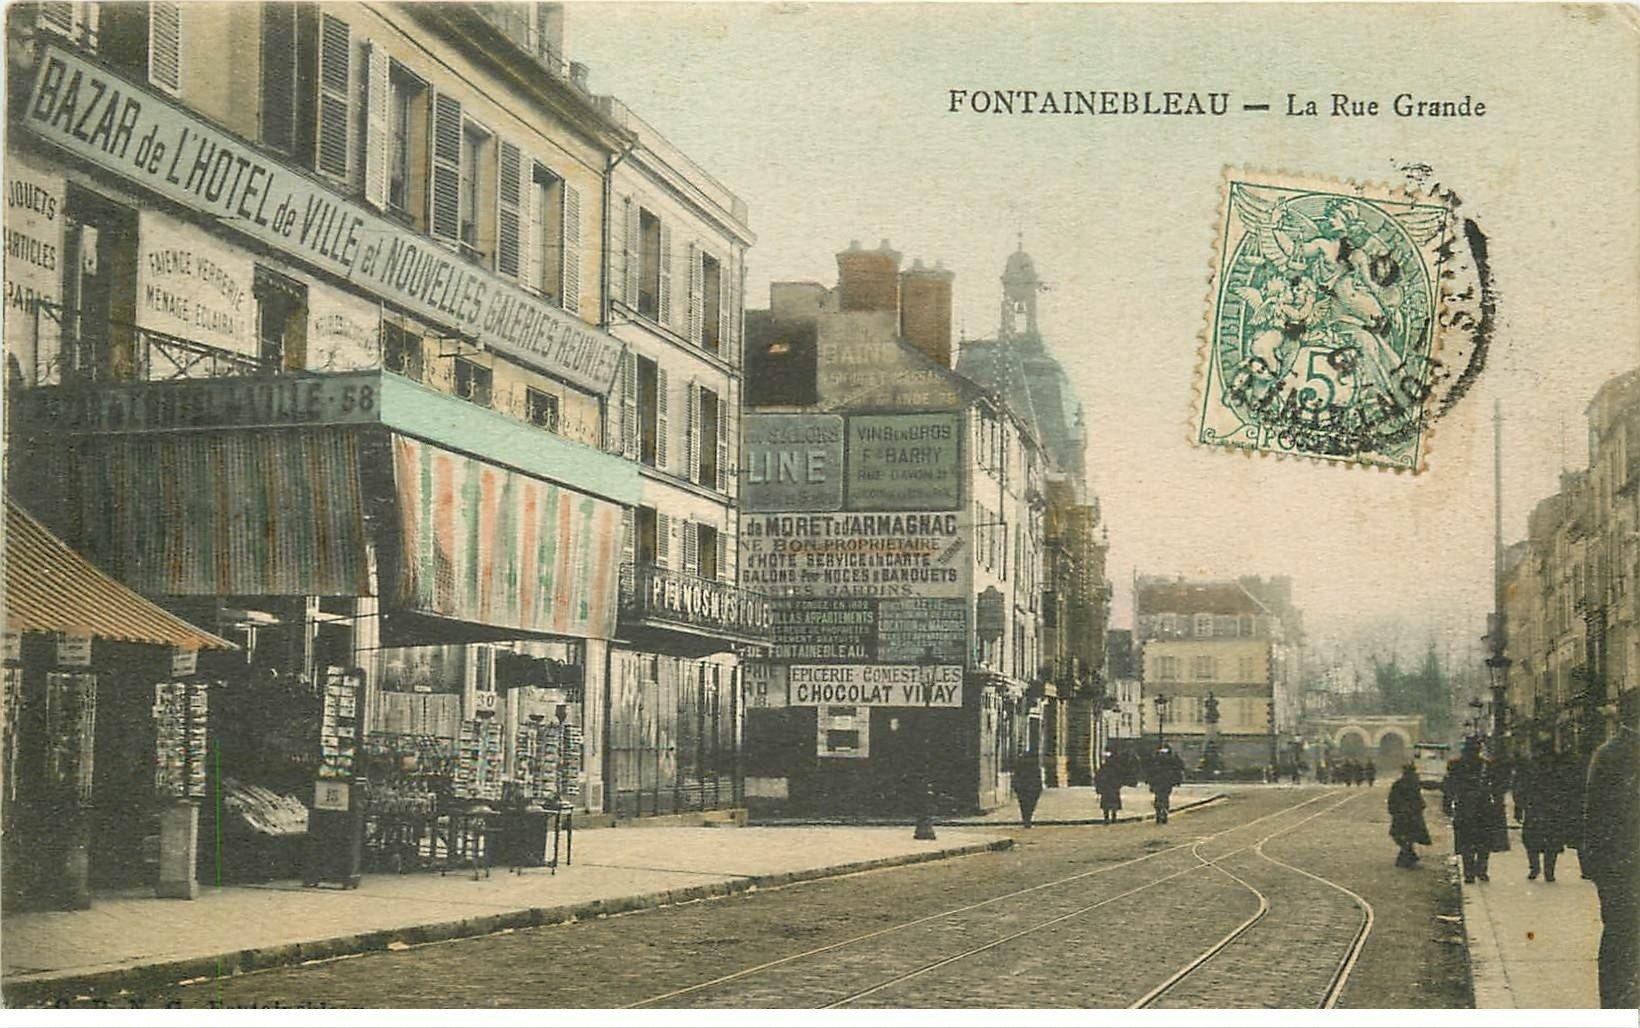 77 Fontainebleau  Grande Rue 1906 Cartes Postale Au Bazar